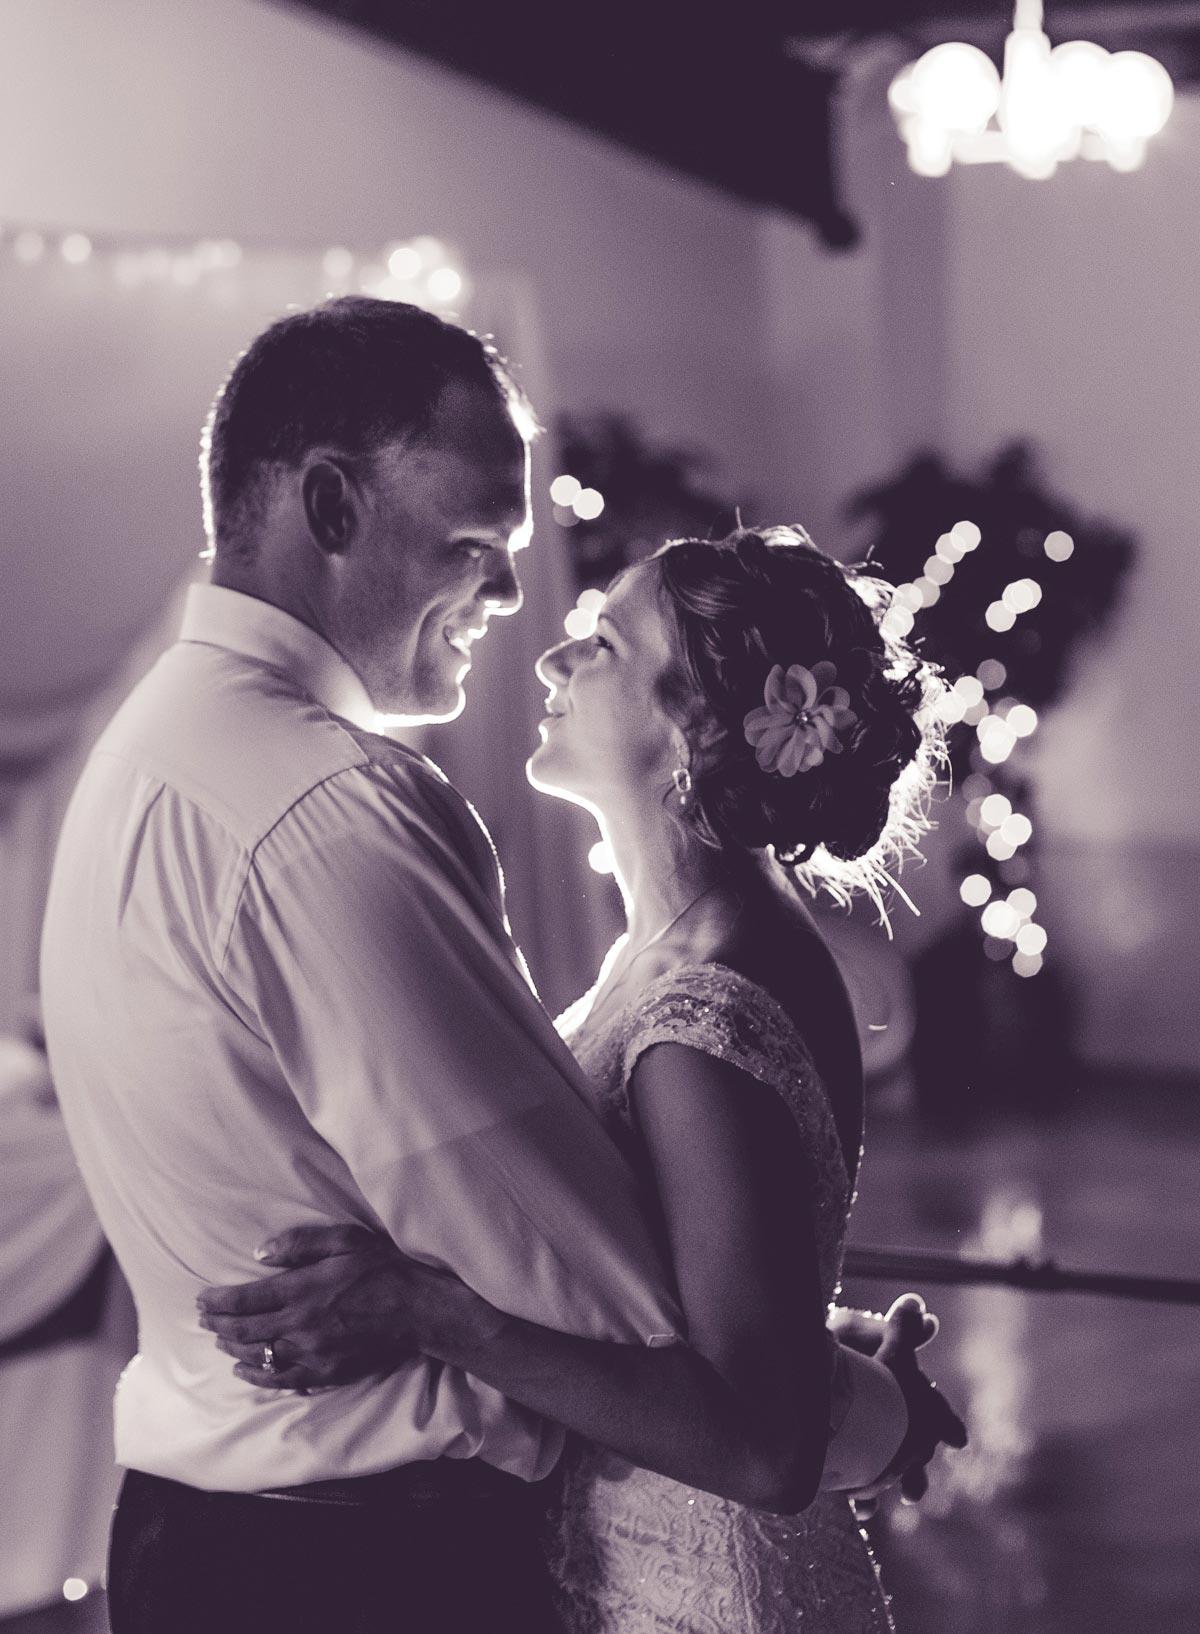 evansville-wedding-photographer-pabst-photo-kokies-echo-valley-(90)